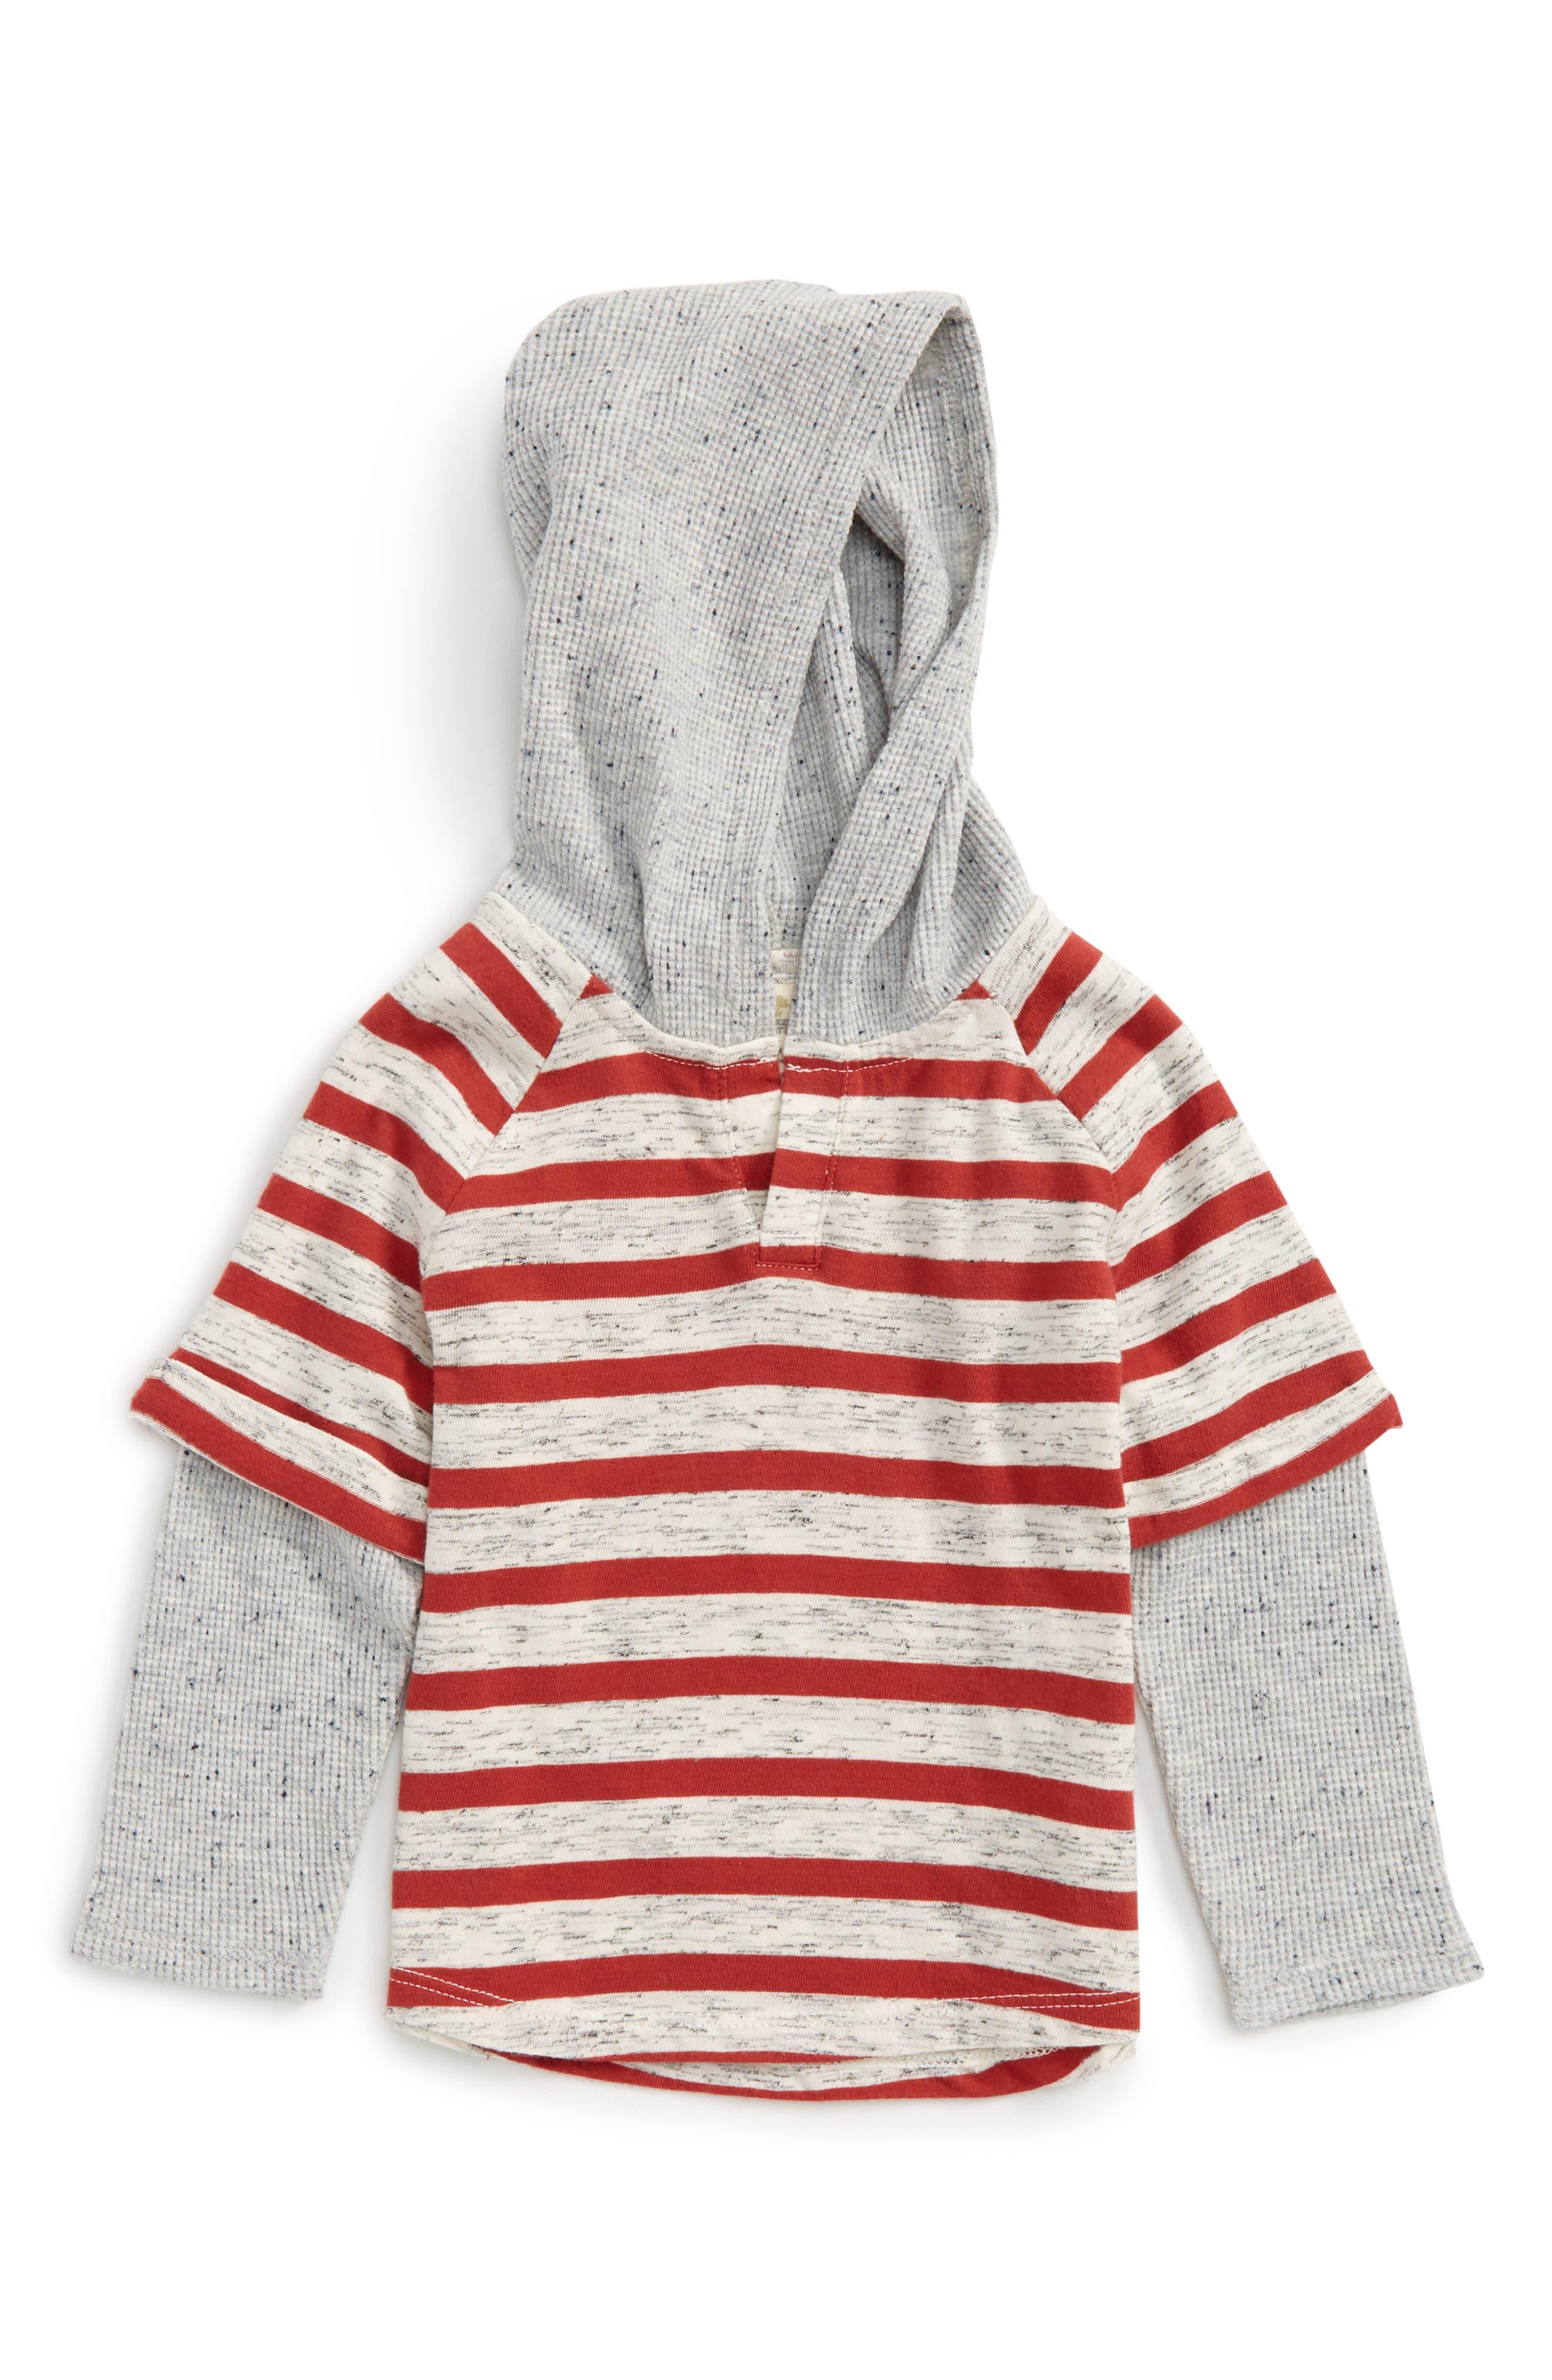 Hooded Raglan Layered T-Shirt,                             Main thumbnail 1, color,                             Rust Bossa Nova- Ivory Stripe